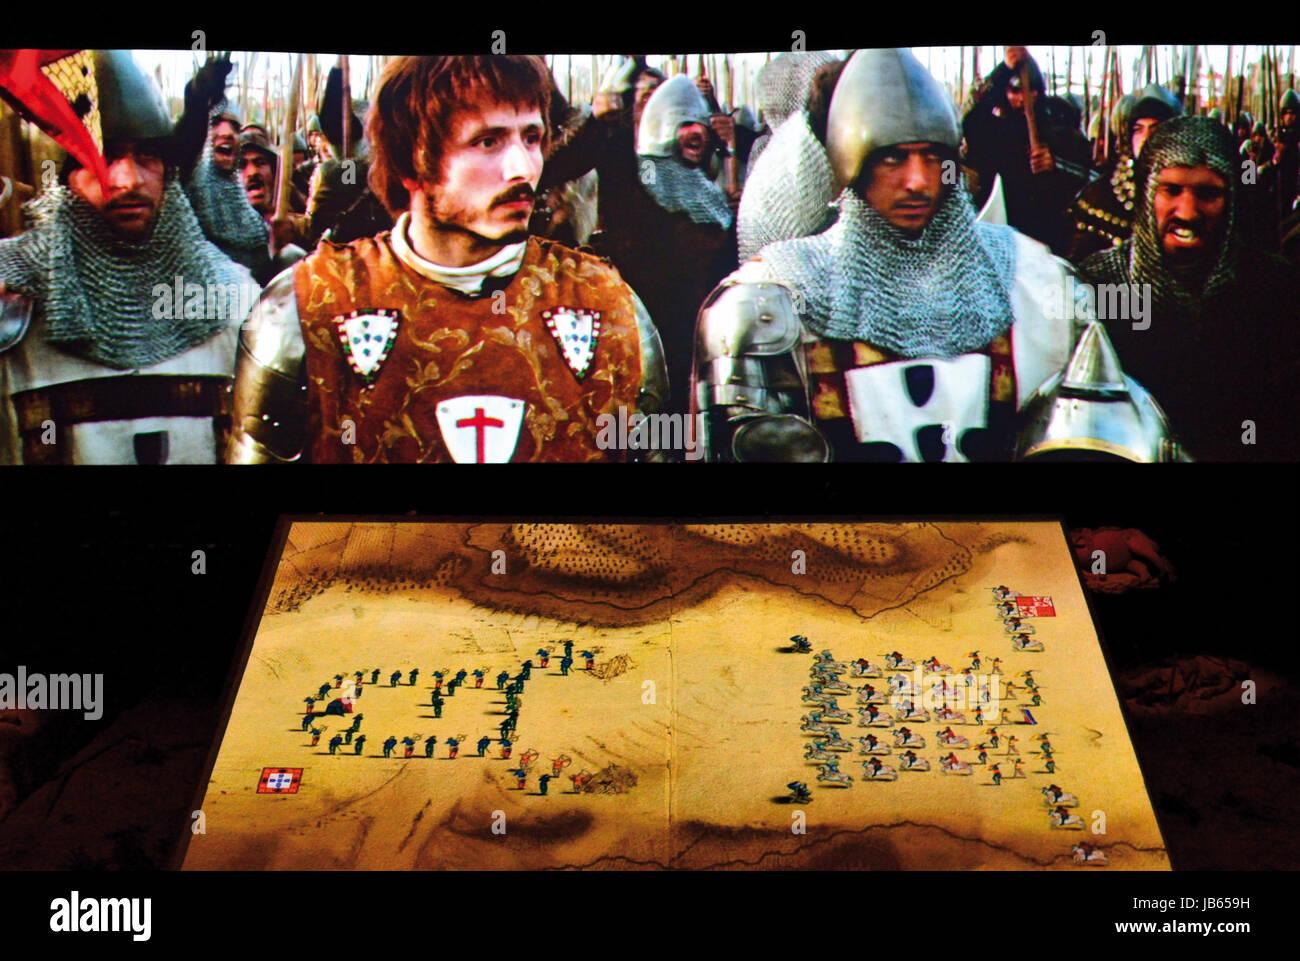 Scene of a movie abotu the historic battle of Aljubarrota in the Interpretation Centre of Aljubarrota Battle near - Stock Image